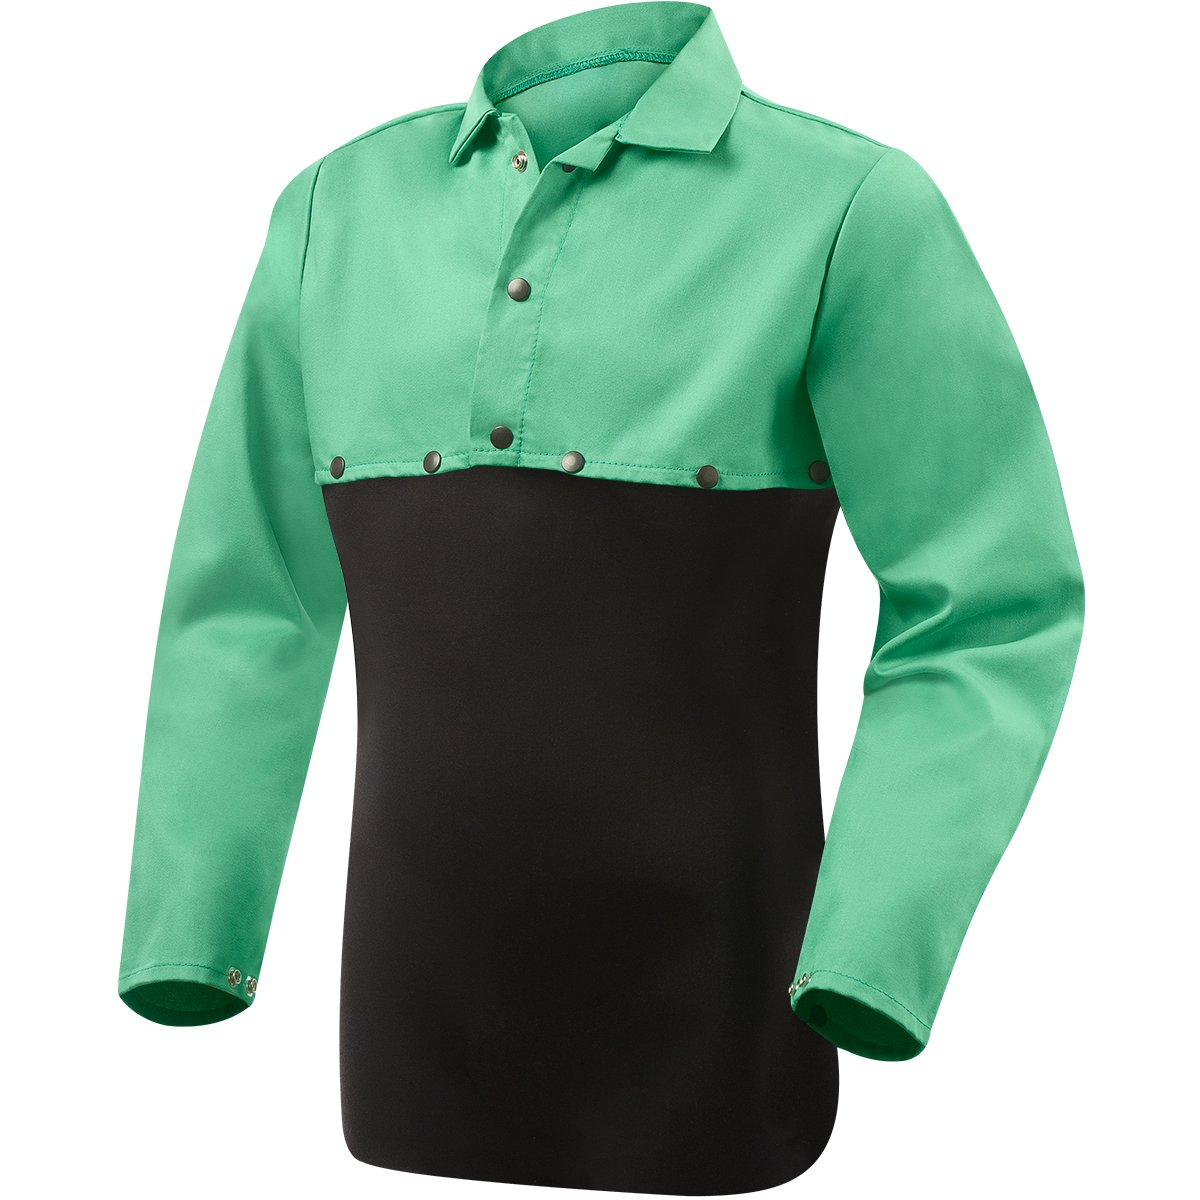 Steiner 1032-L Cape Sleeve, Weldlite Green 9.5-Ounce Flame Retardant Cotton, Large